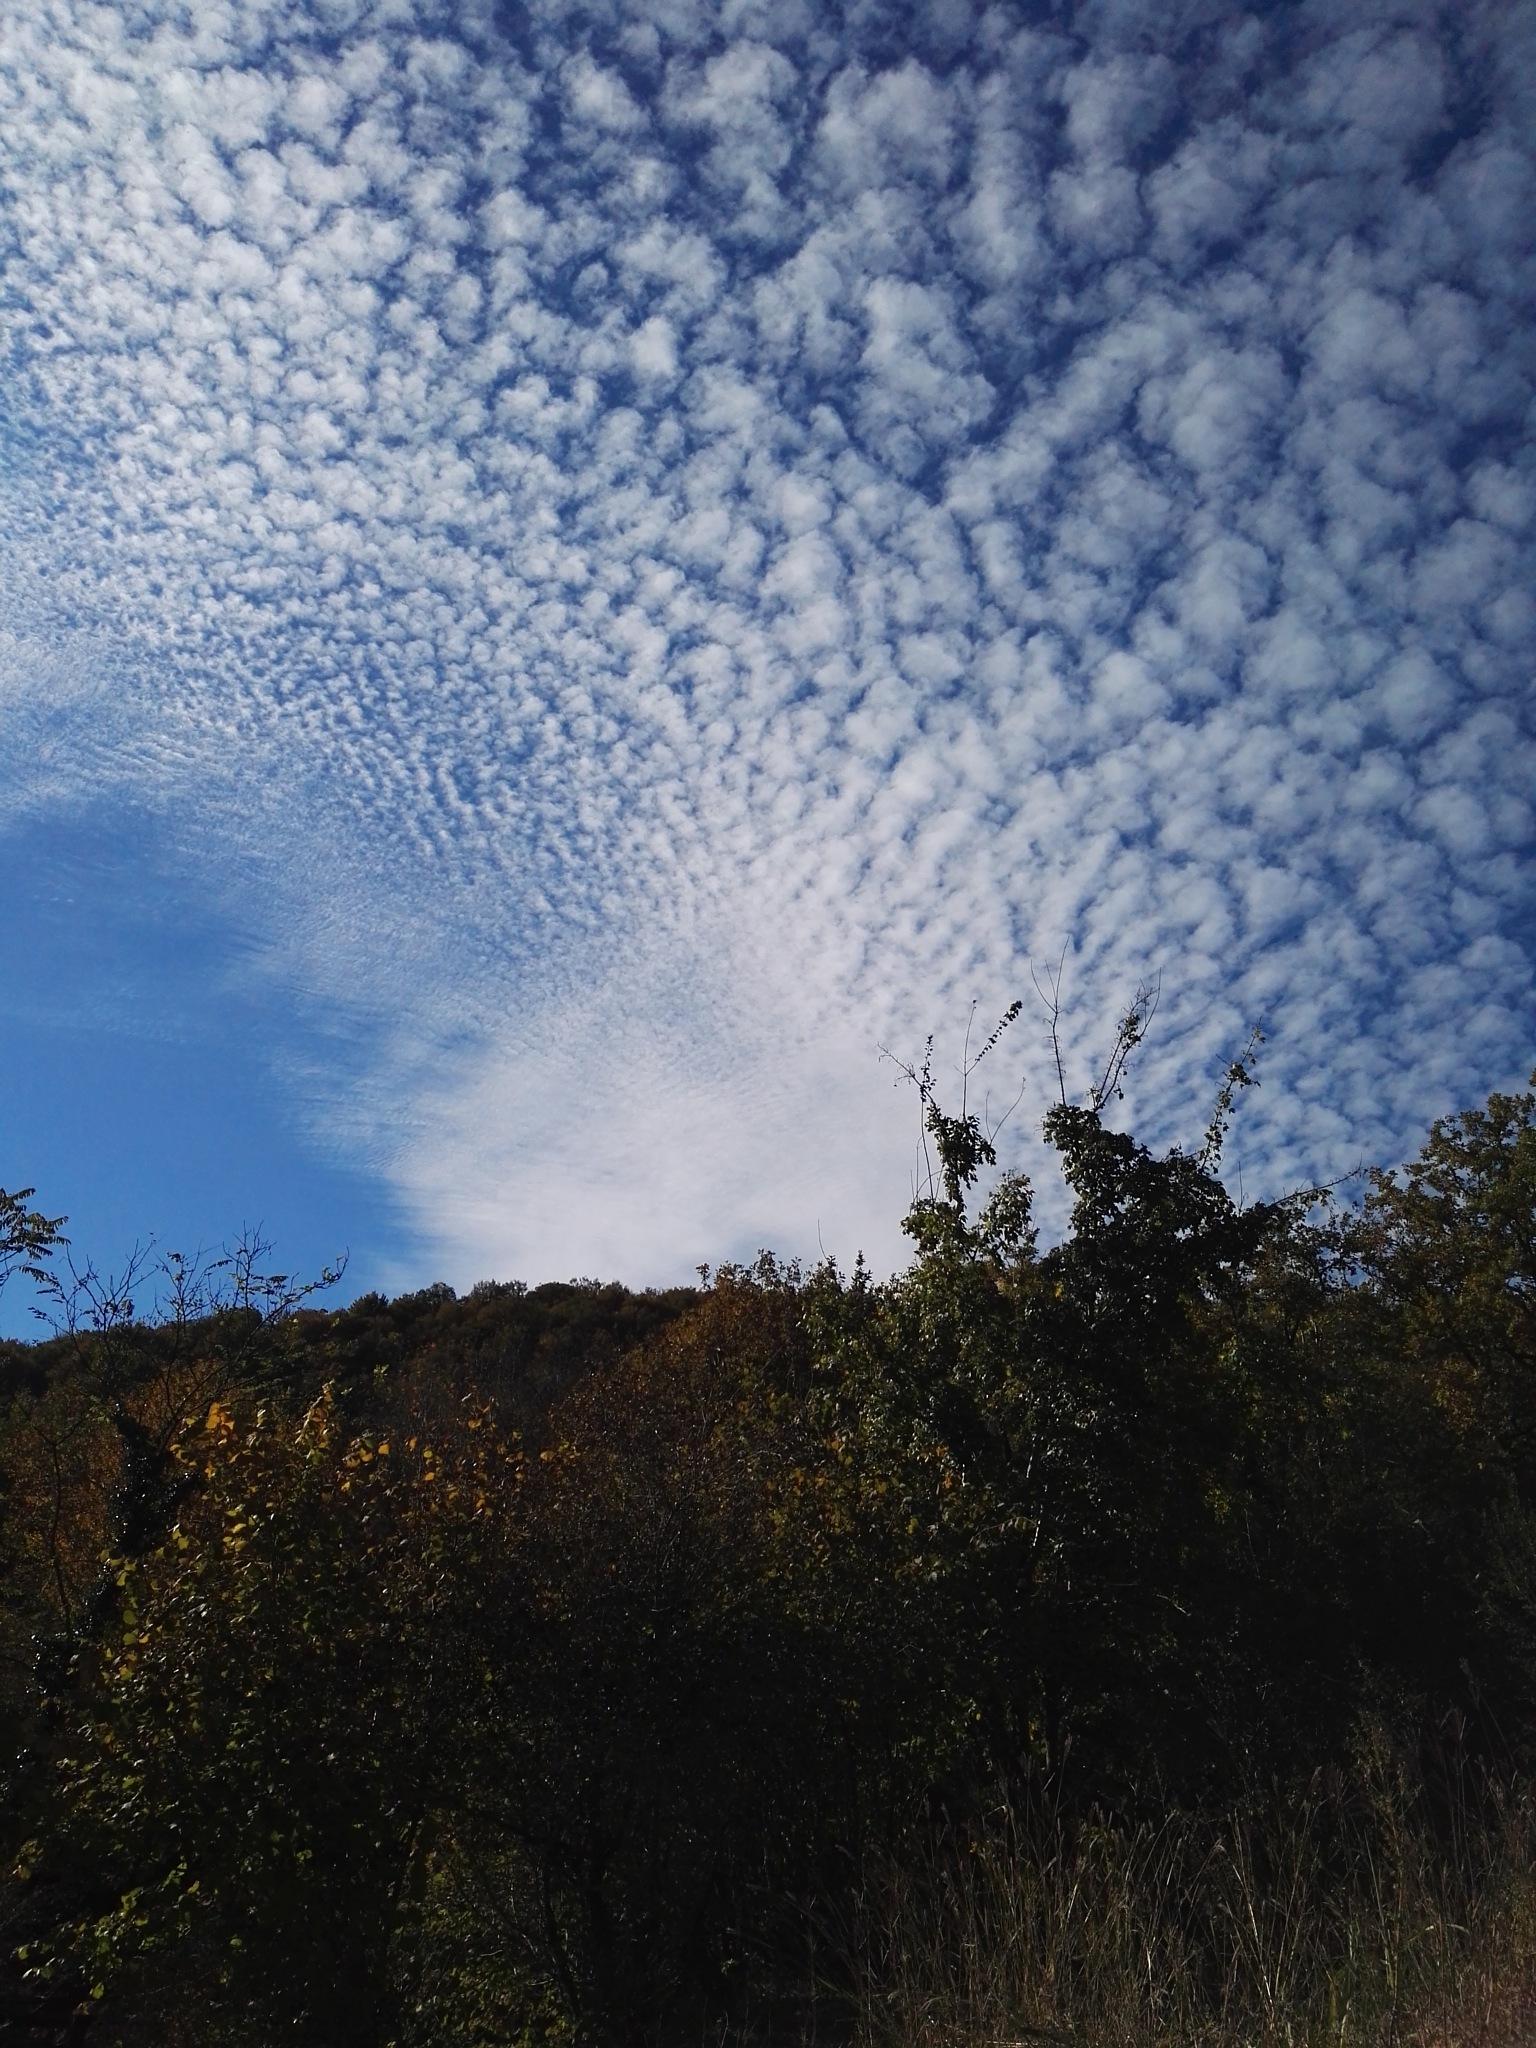 martvili,s sky by Ariyapour